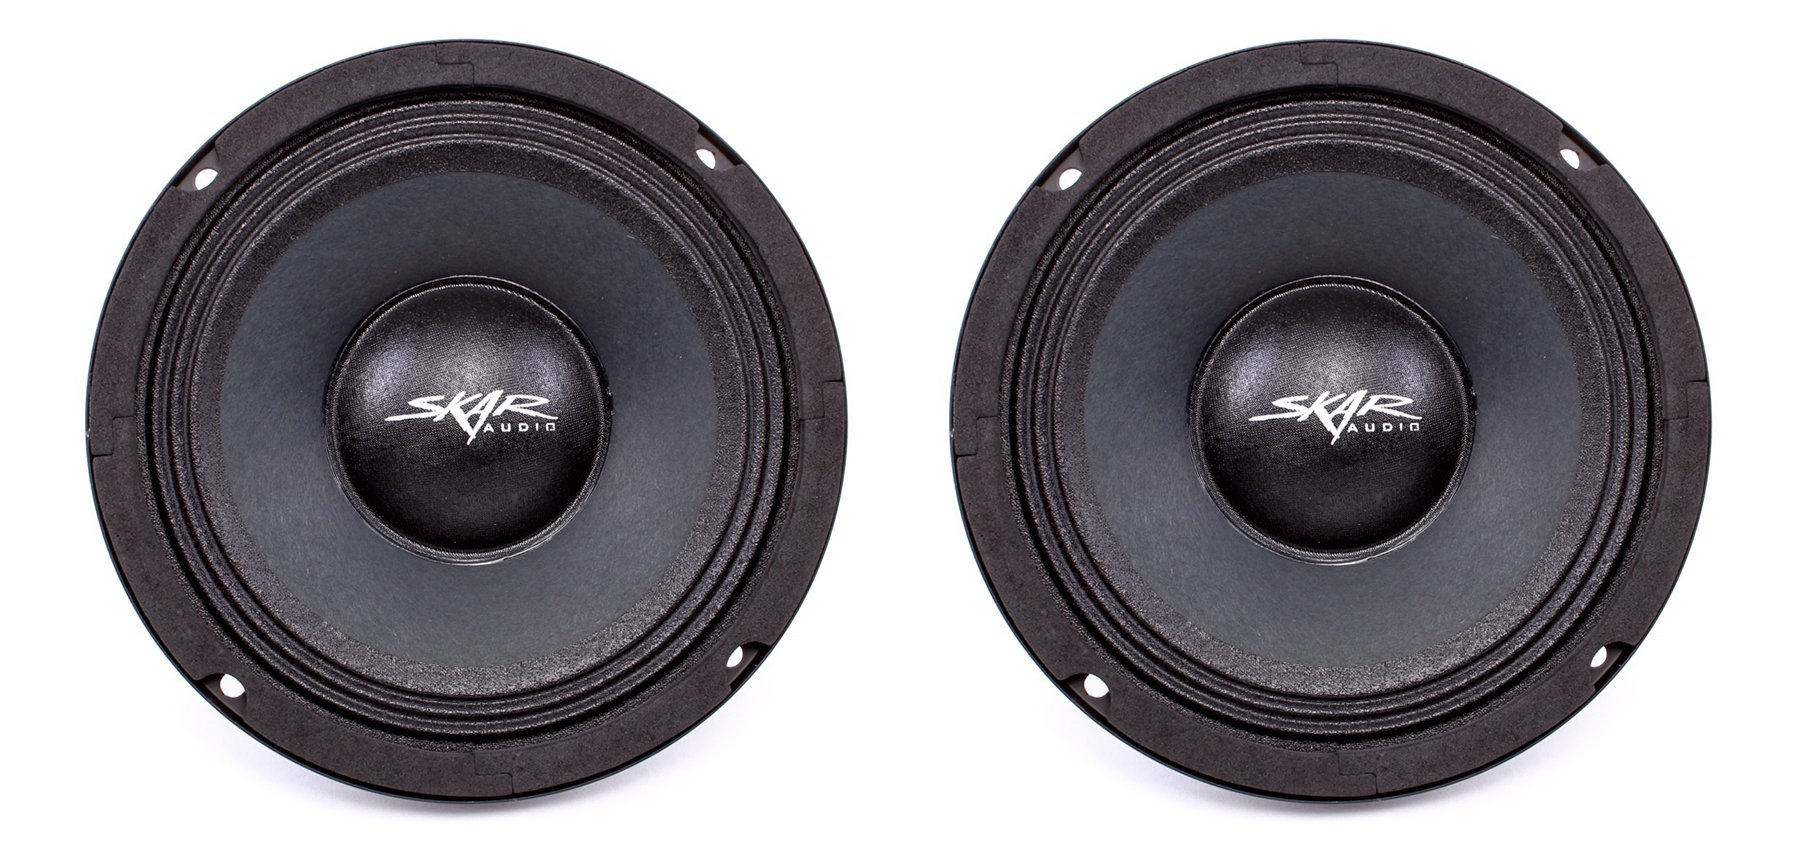 (2) Skar Audio FSX65-4 300-Watt 6.5-Inch 4 Ohm Mid-Range Loudspeakers - 2 Speakers